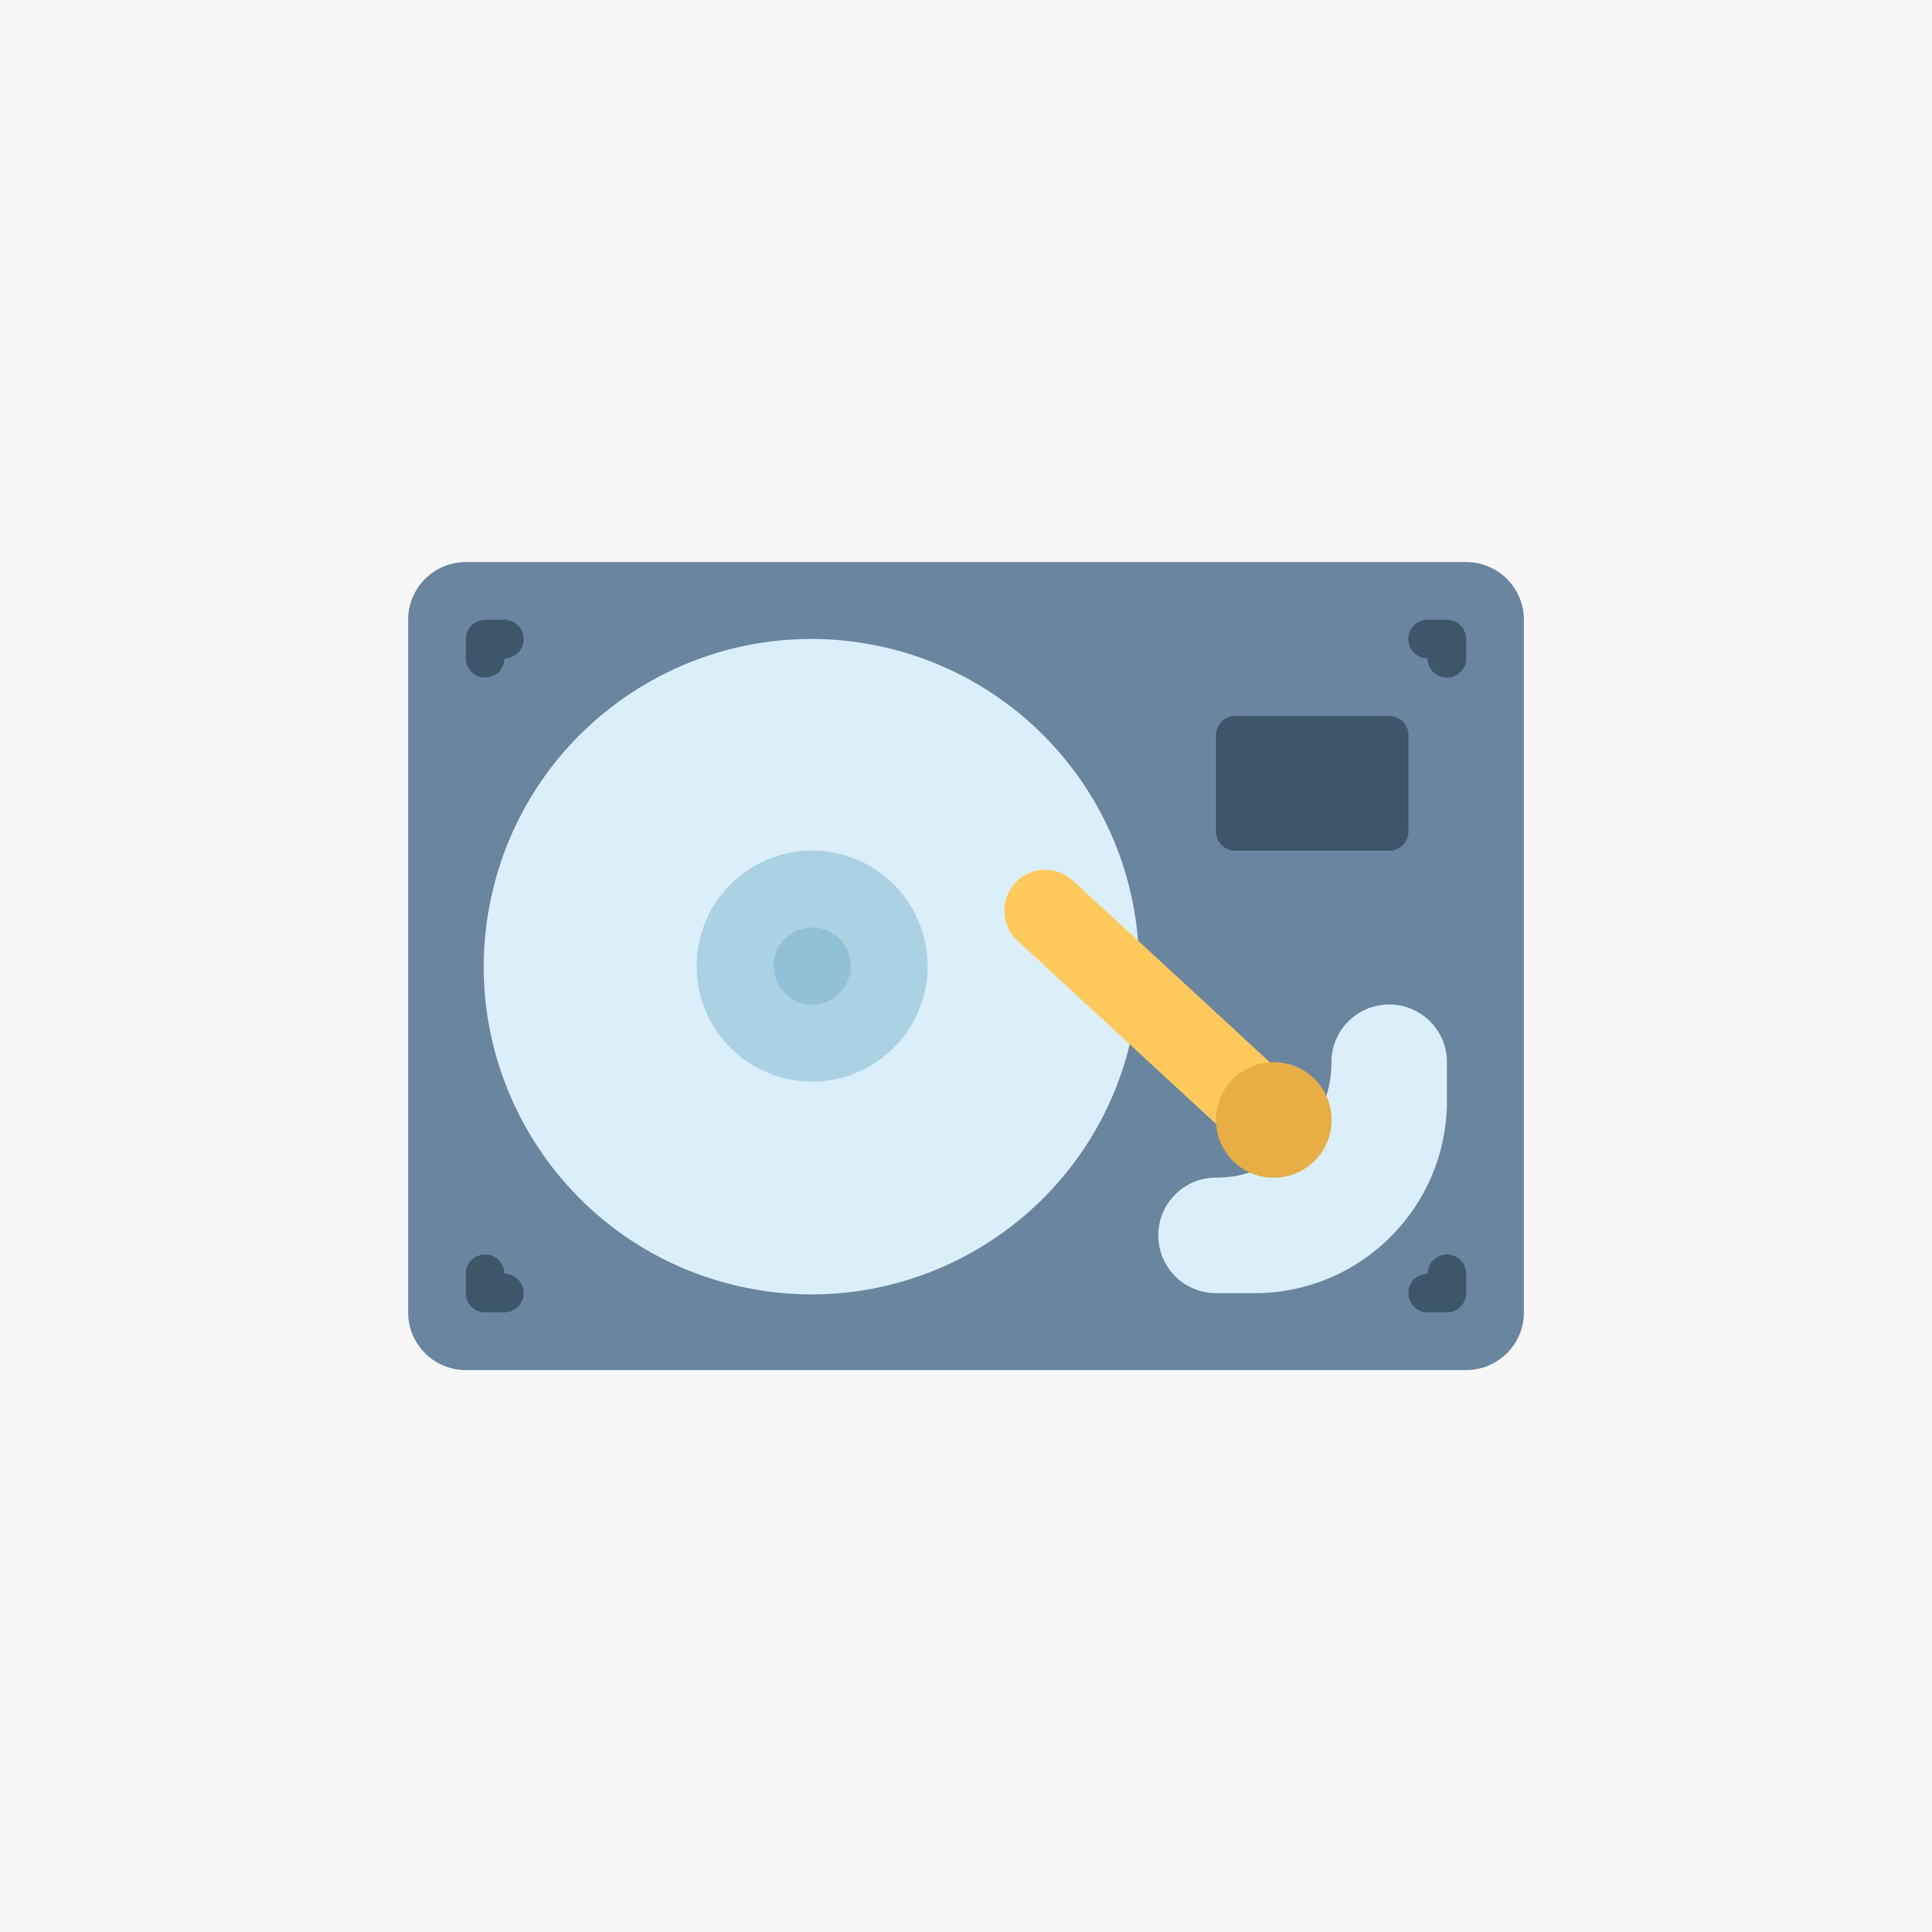 MB ASUS A7N8X-X SKT 462, SHIELD, 5X PCI, 1X AGP, 4USB/LAN/S/P/A/